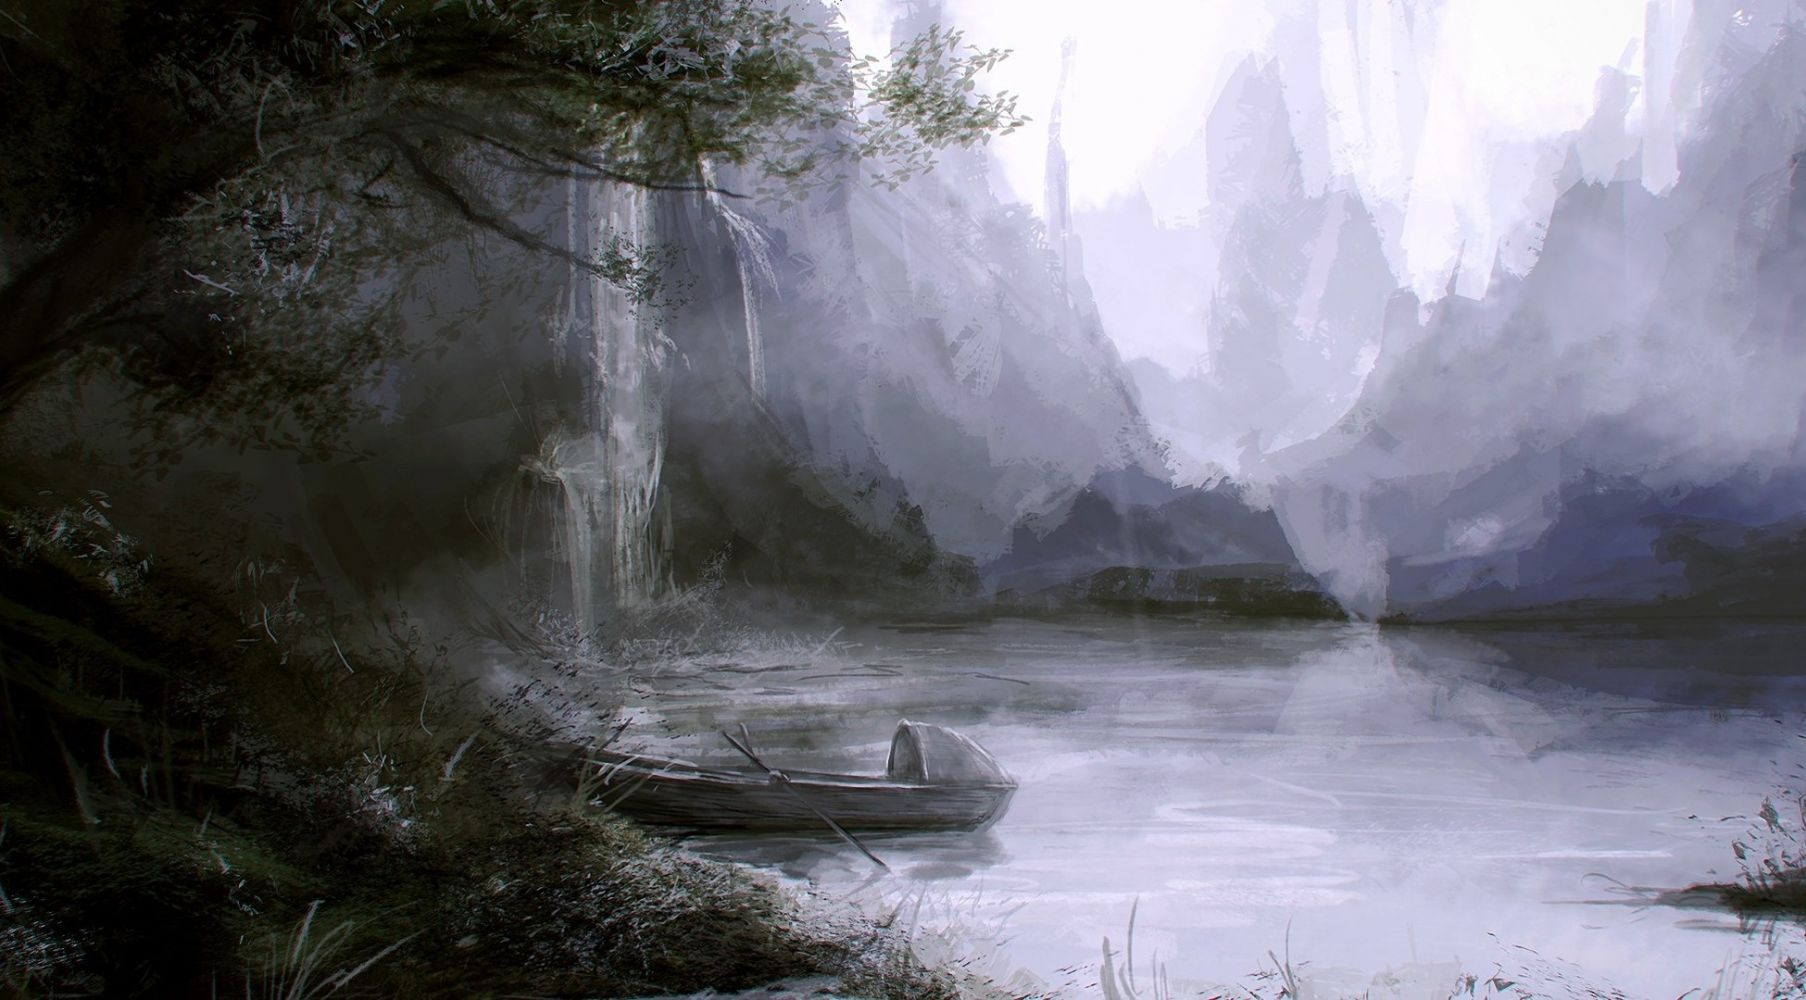 kartinki-fentezi-priroda-pevitsa-nyusha-soset-chlen